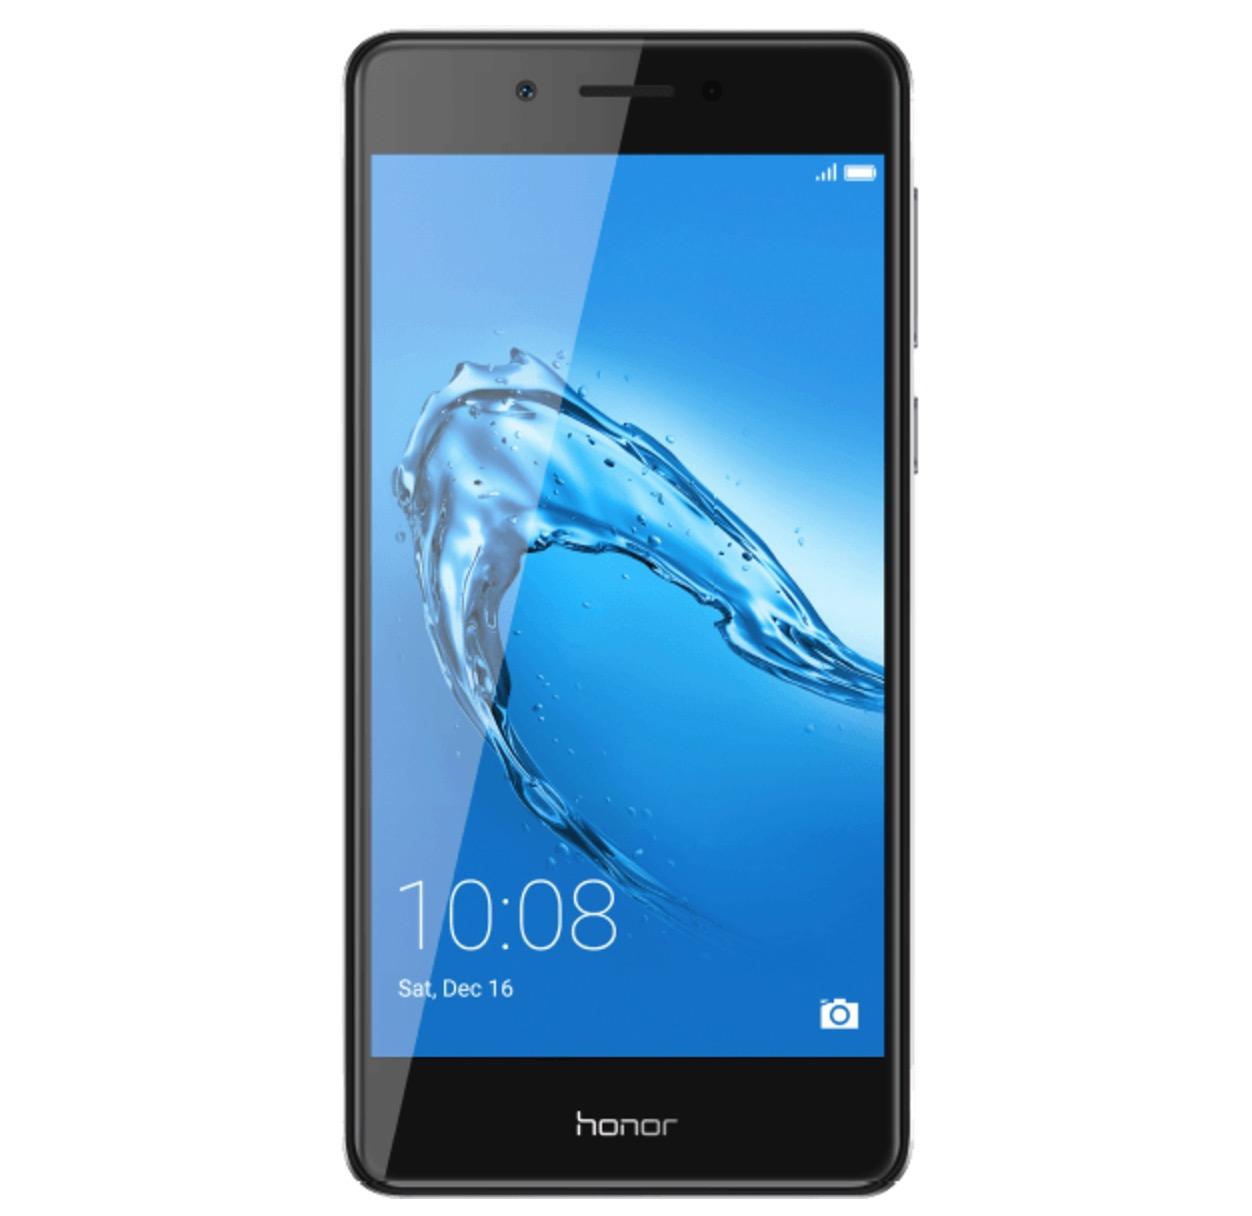 Abgelaufen! Huawei Honor 6c Dual SIM Smartphone mit 32 GB für nur 59,- Euro inkl. Versand